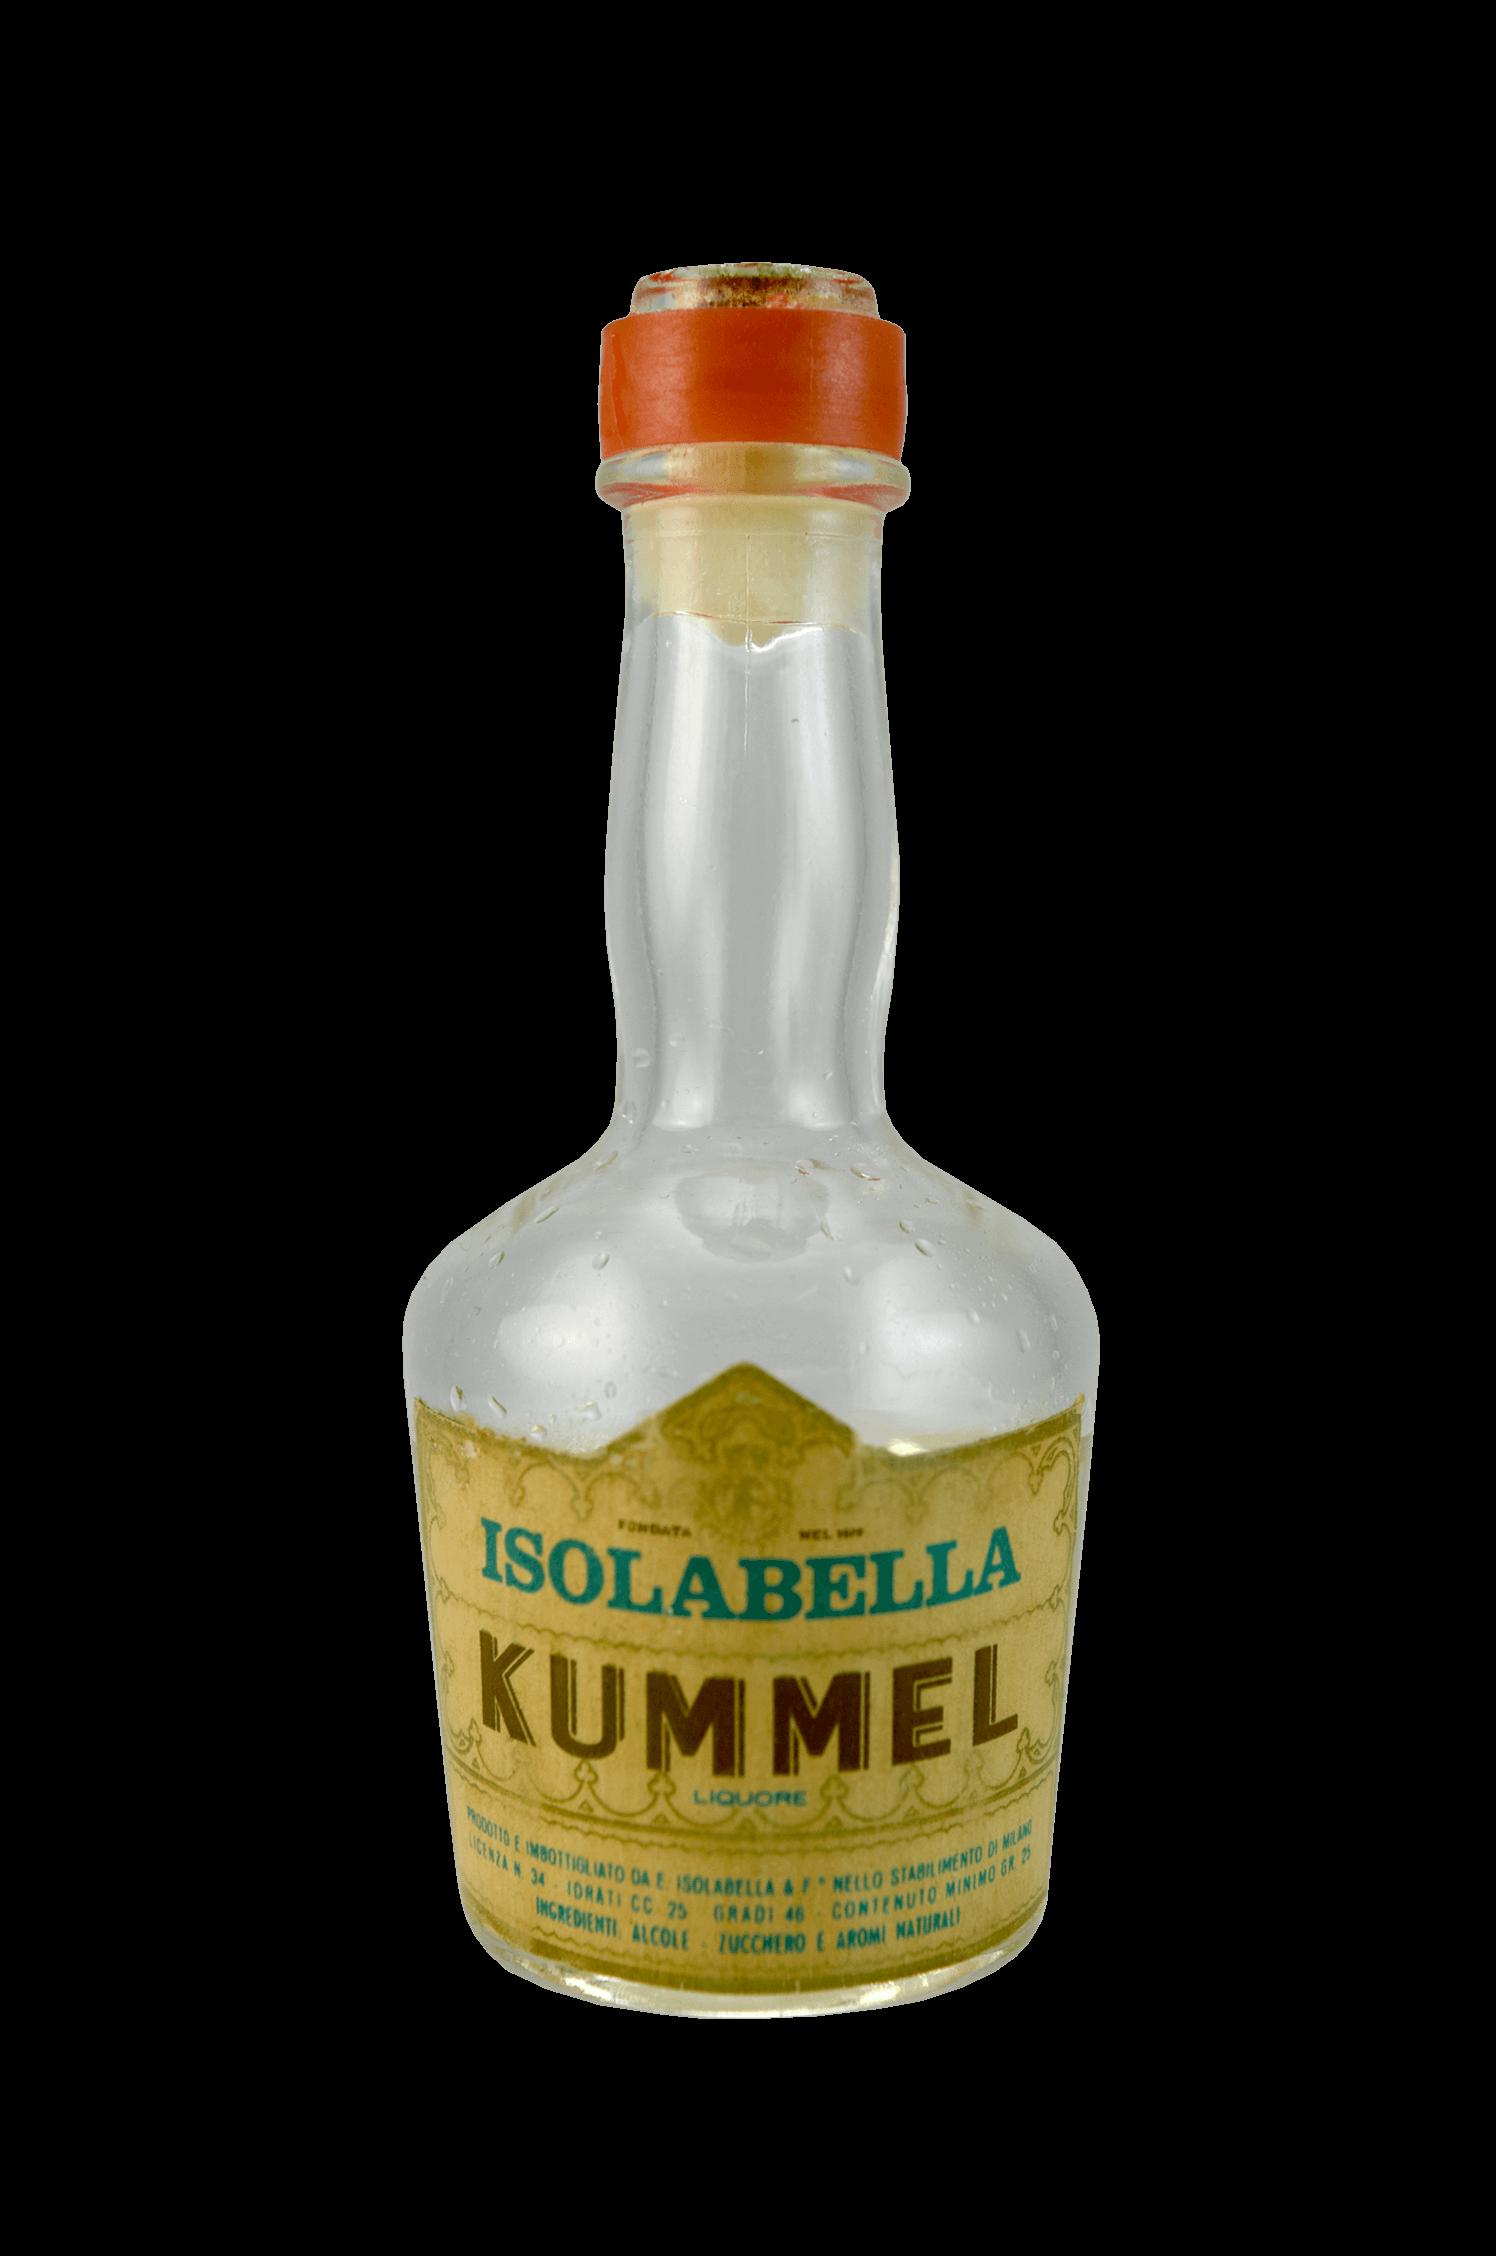 Isolabella Kummel Liquore